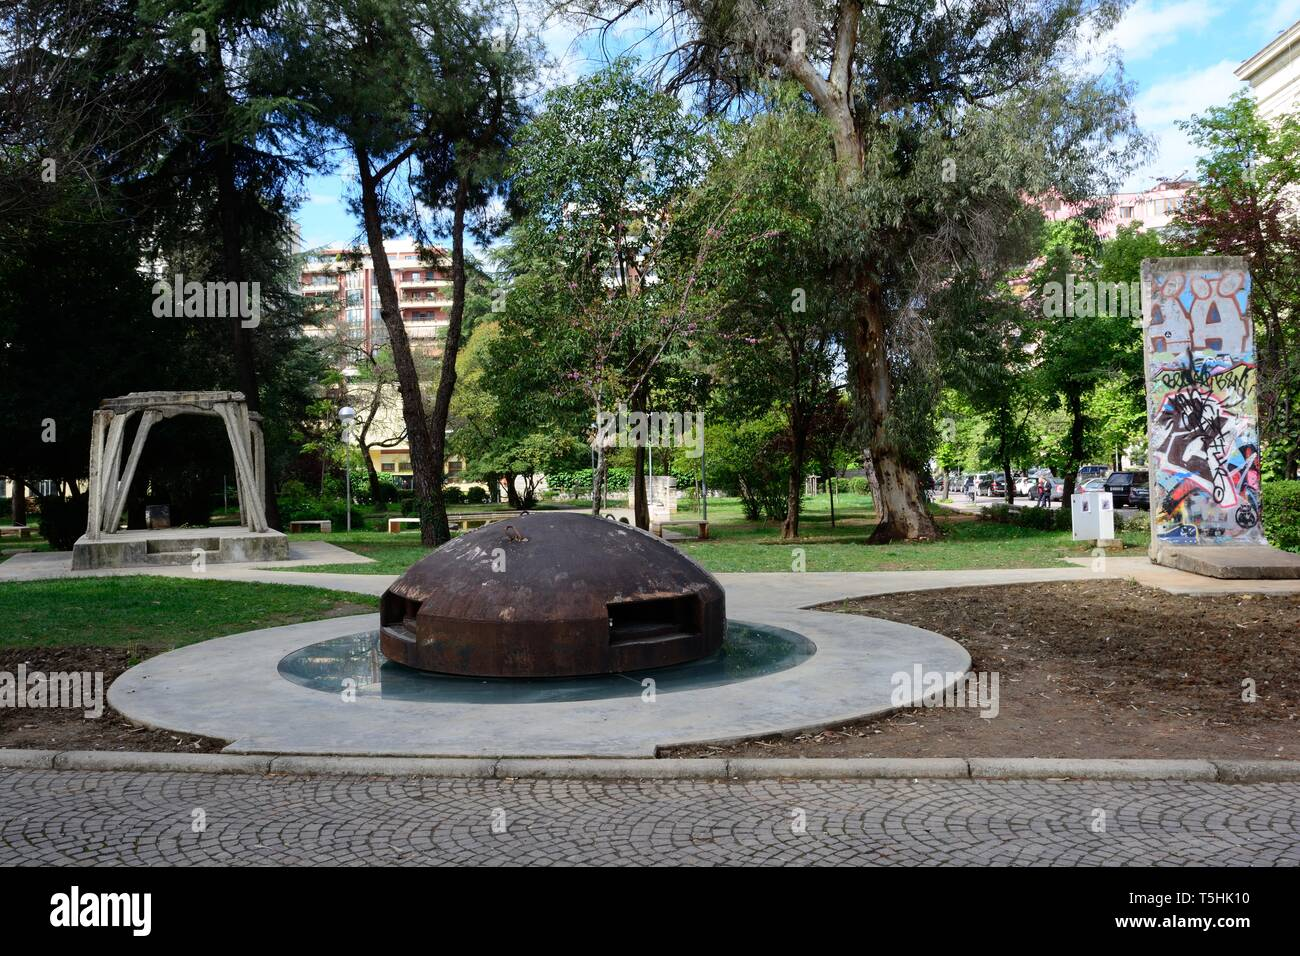 Examples of communist history Tirana Albania - Stock Image